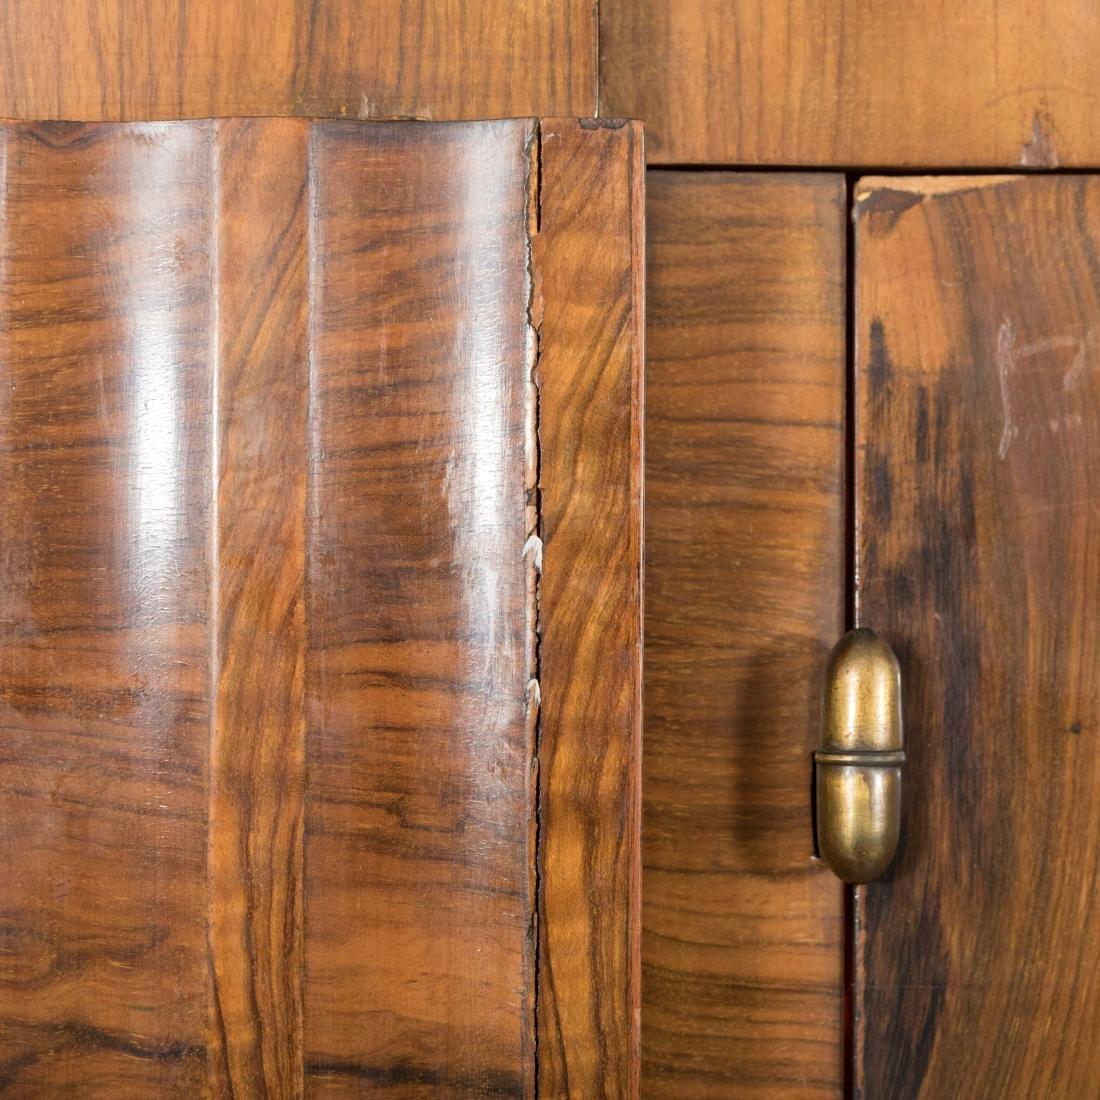 Burled English Art Deco Armoire - Epstein Brothers - 8